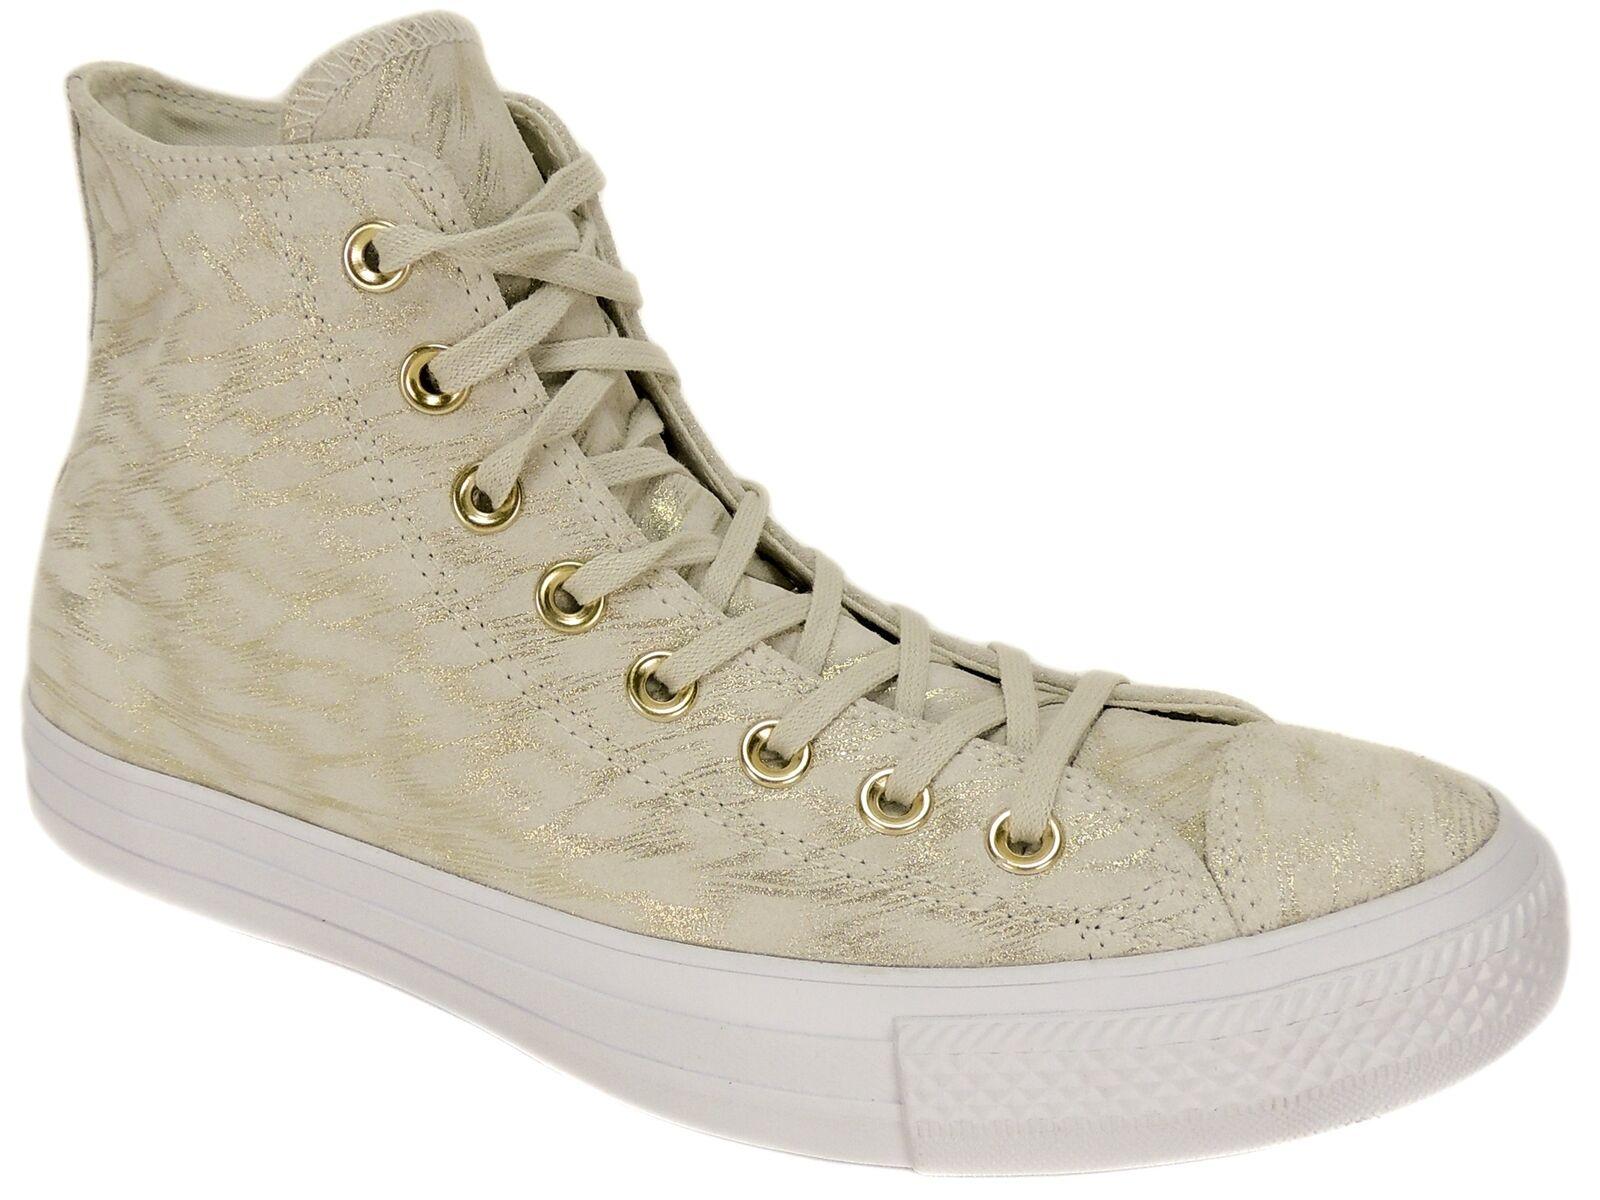 Converse Femme CT Hi Top All Star Sneakers Buff/Buff/Blanc